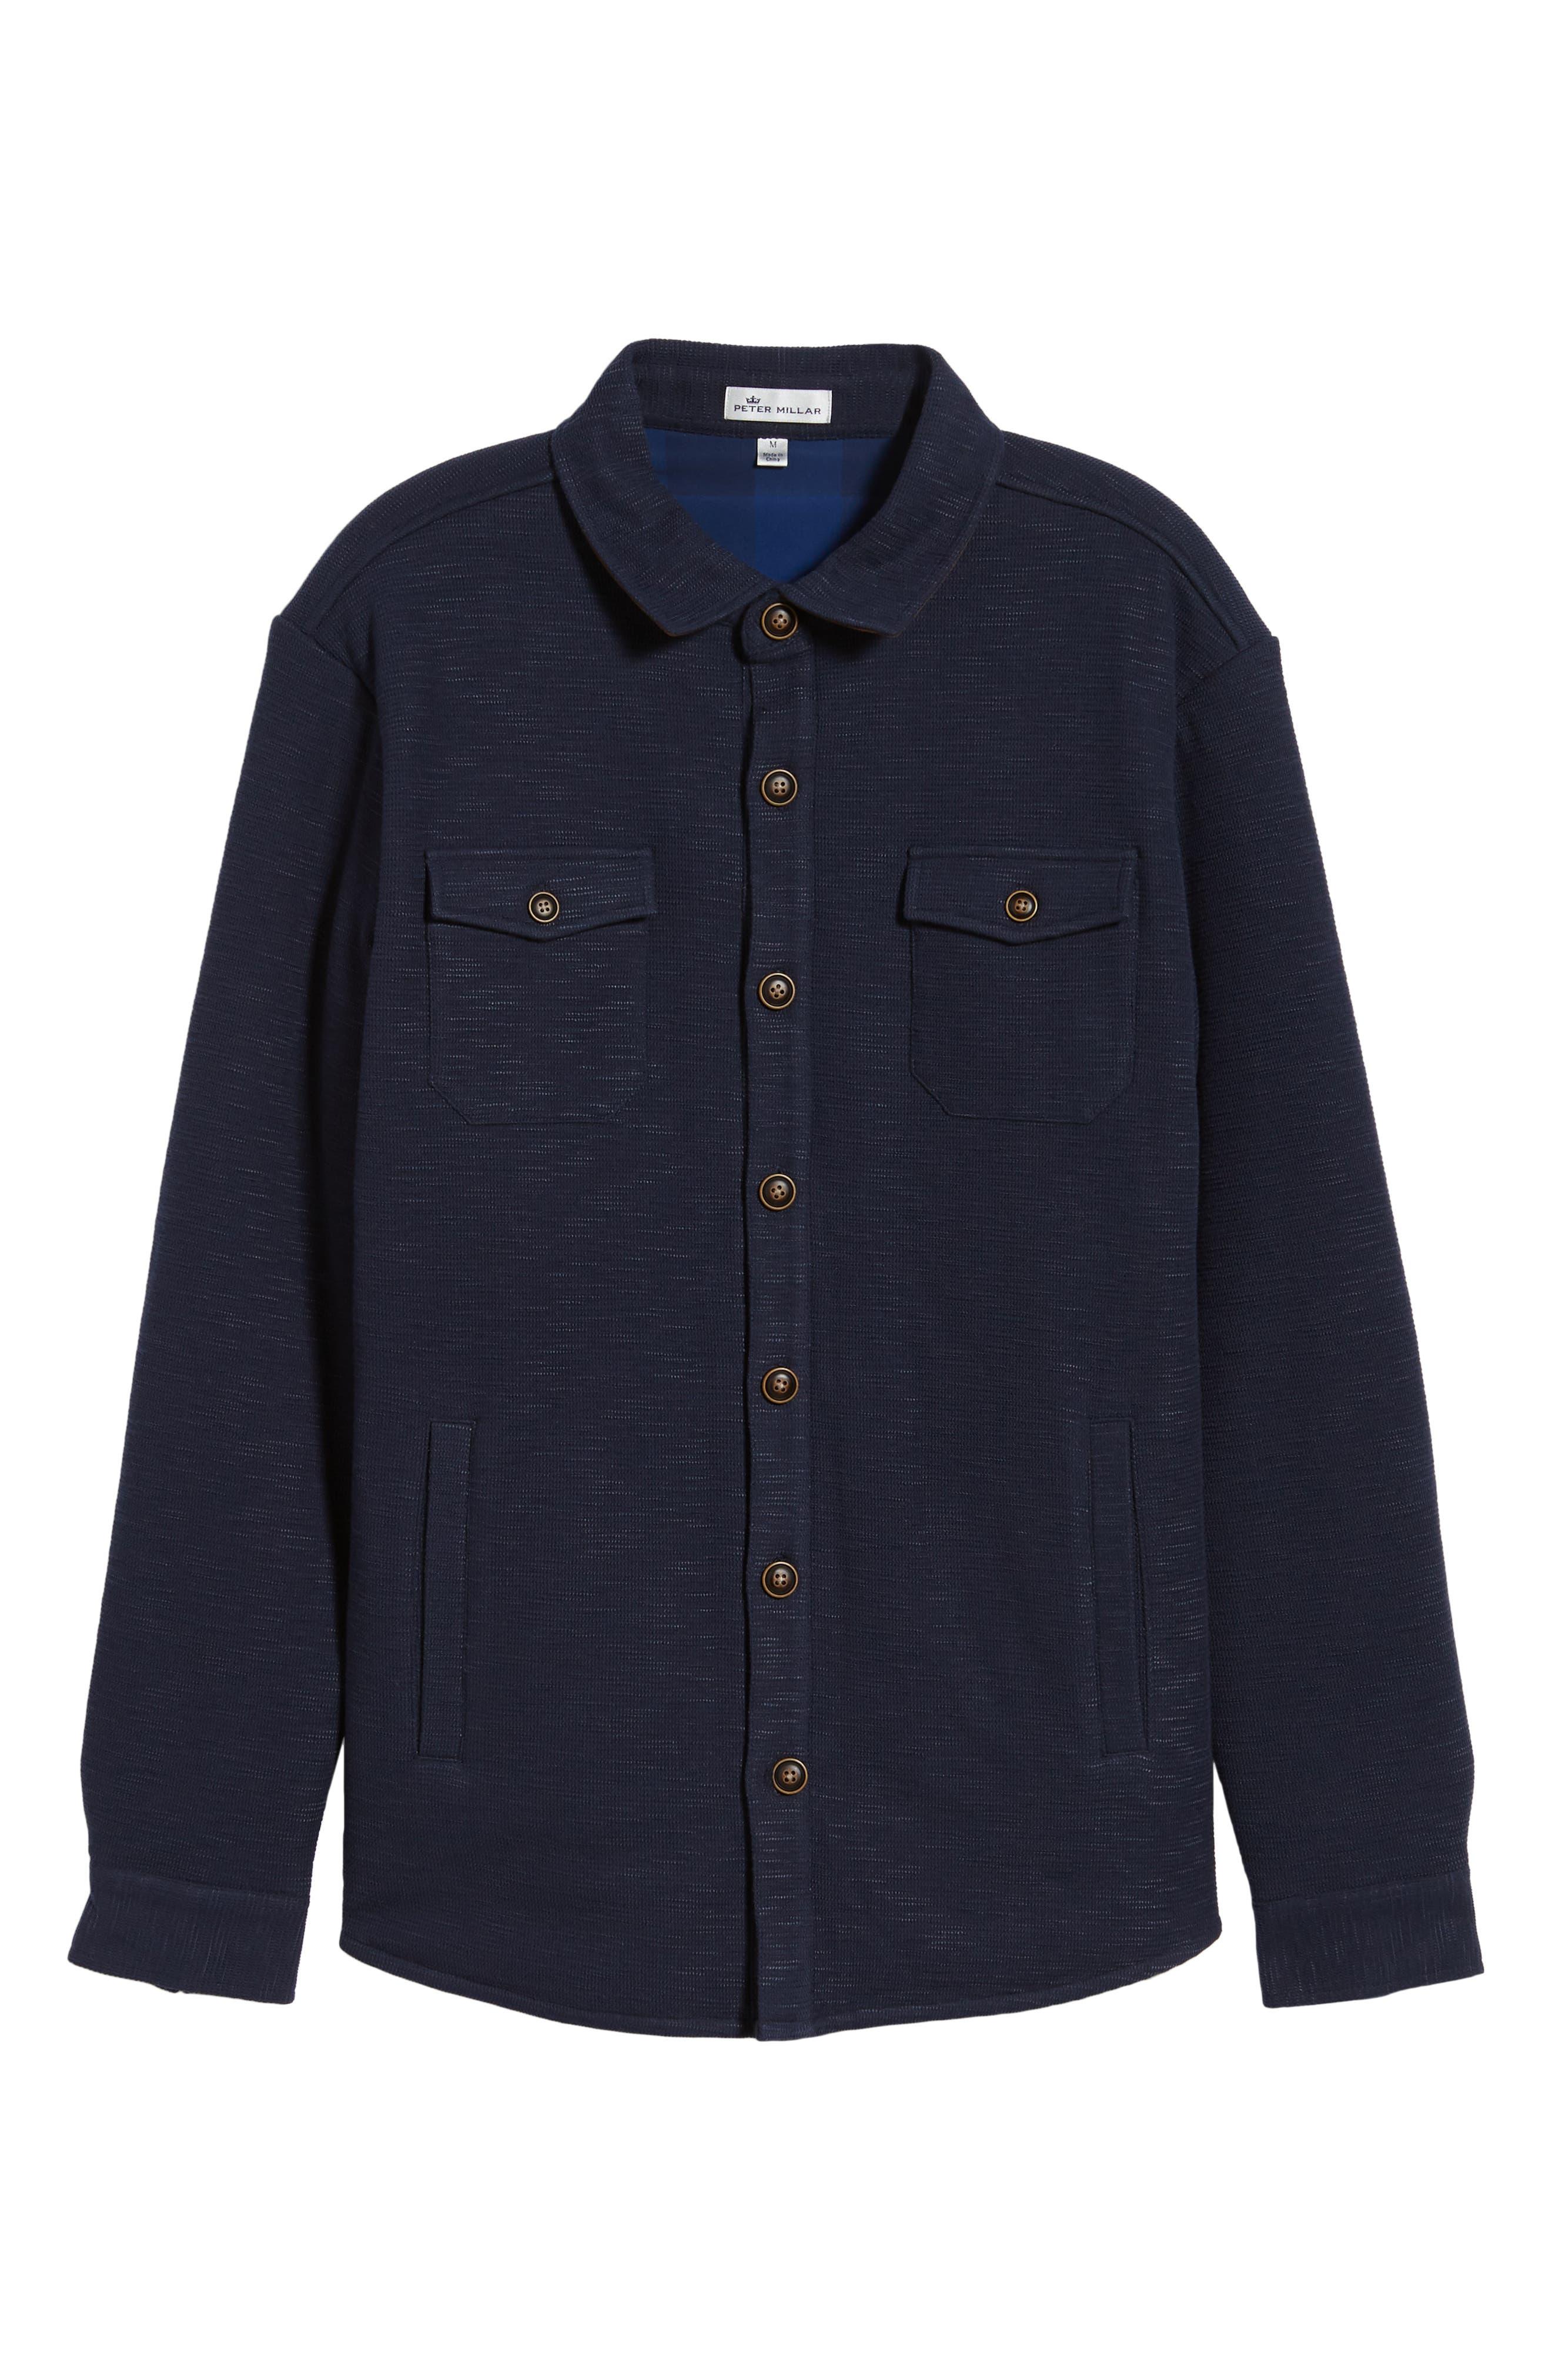 PETER MILLAR,                             Mountainside Shirt Jacket,                             Alternate thumbnail 5, color,                             ATLANTIC BLUE